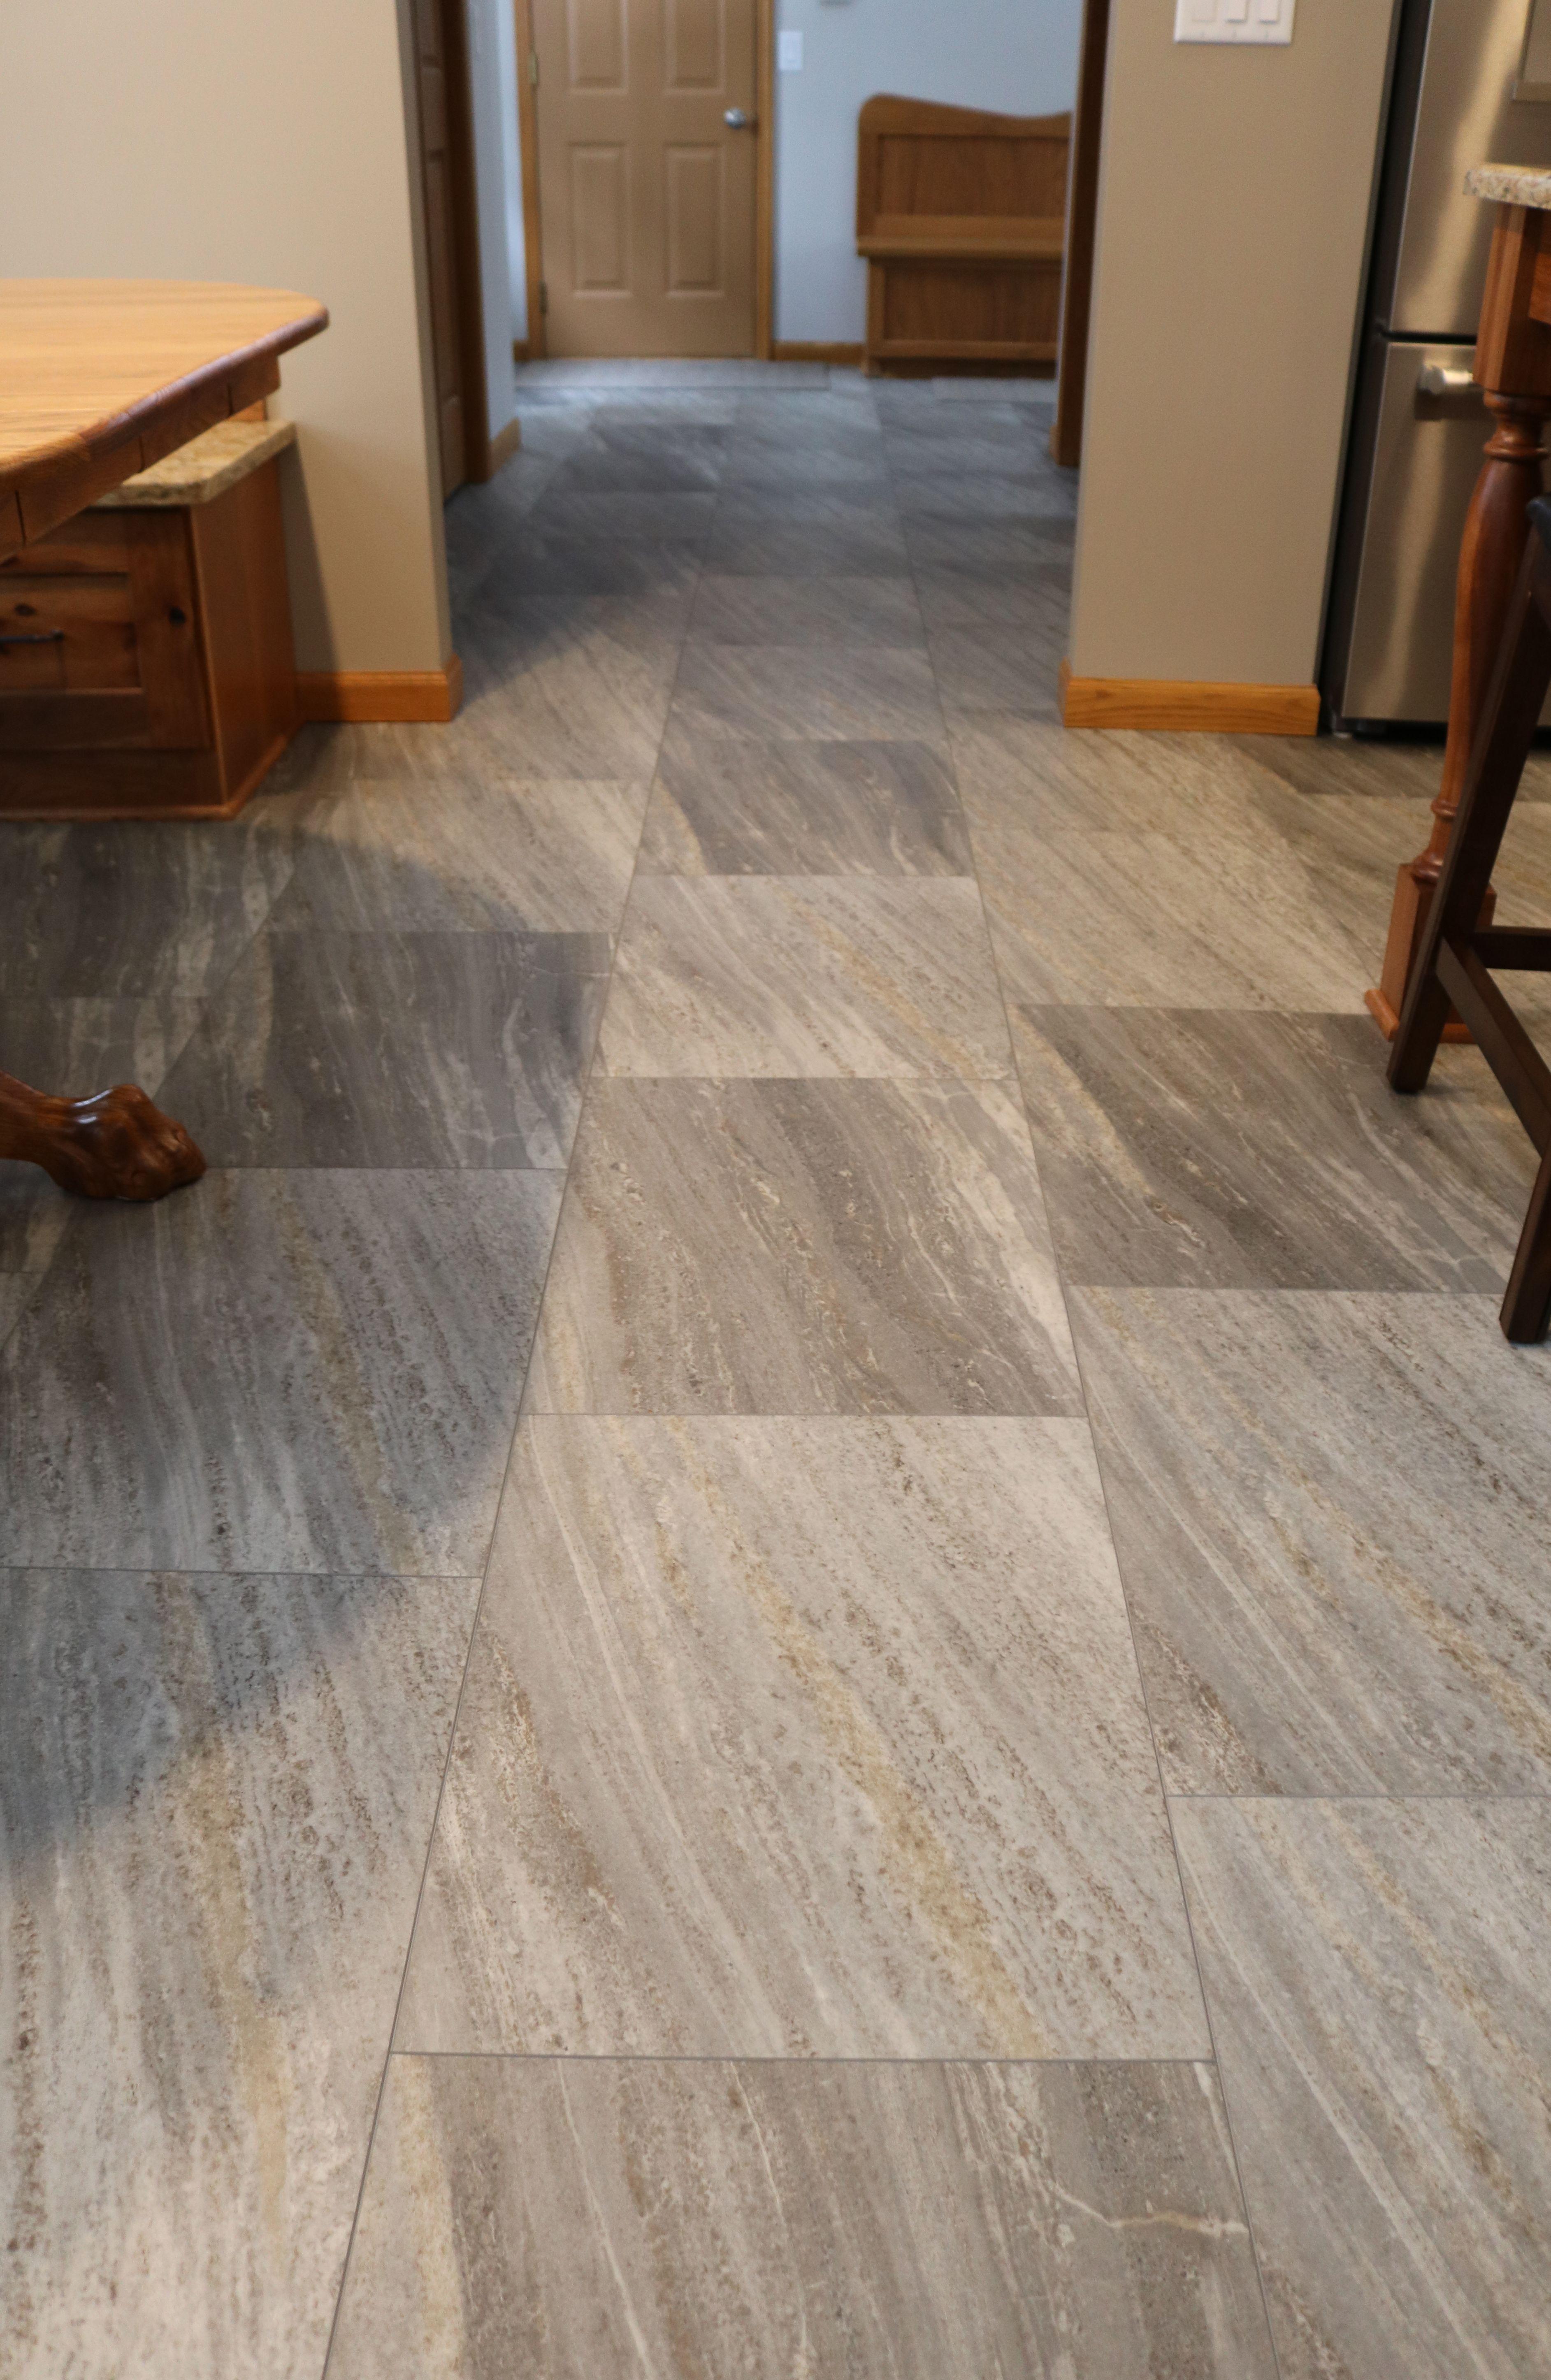 Lvt Flooring Flooring Gorgeous Flooring Lvt Flooring